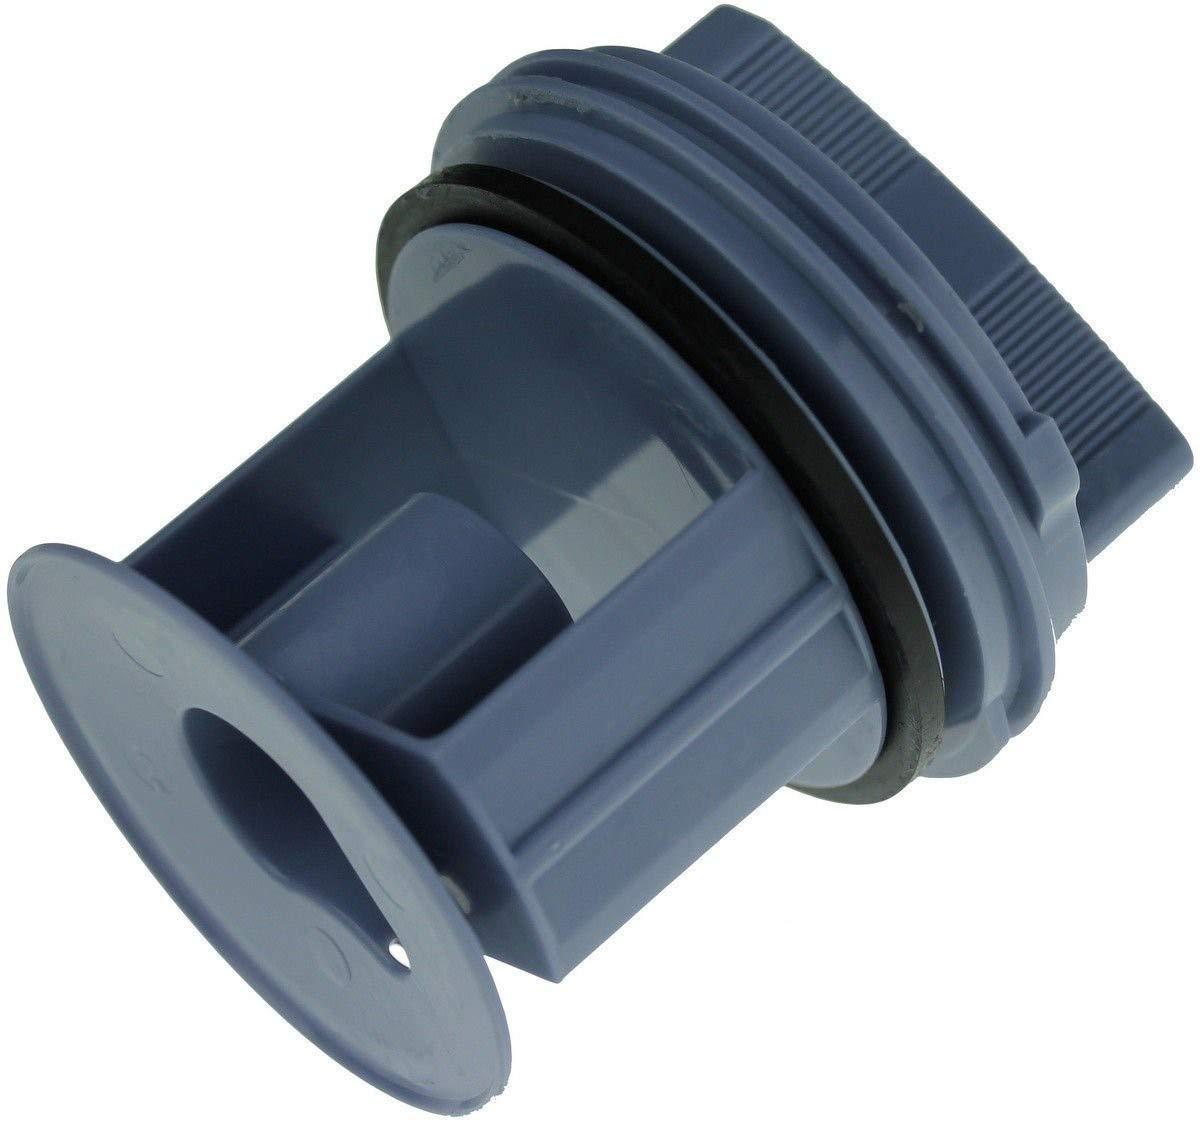 Bosch 00647920 Lint Filter for Washing Machine